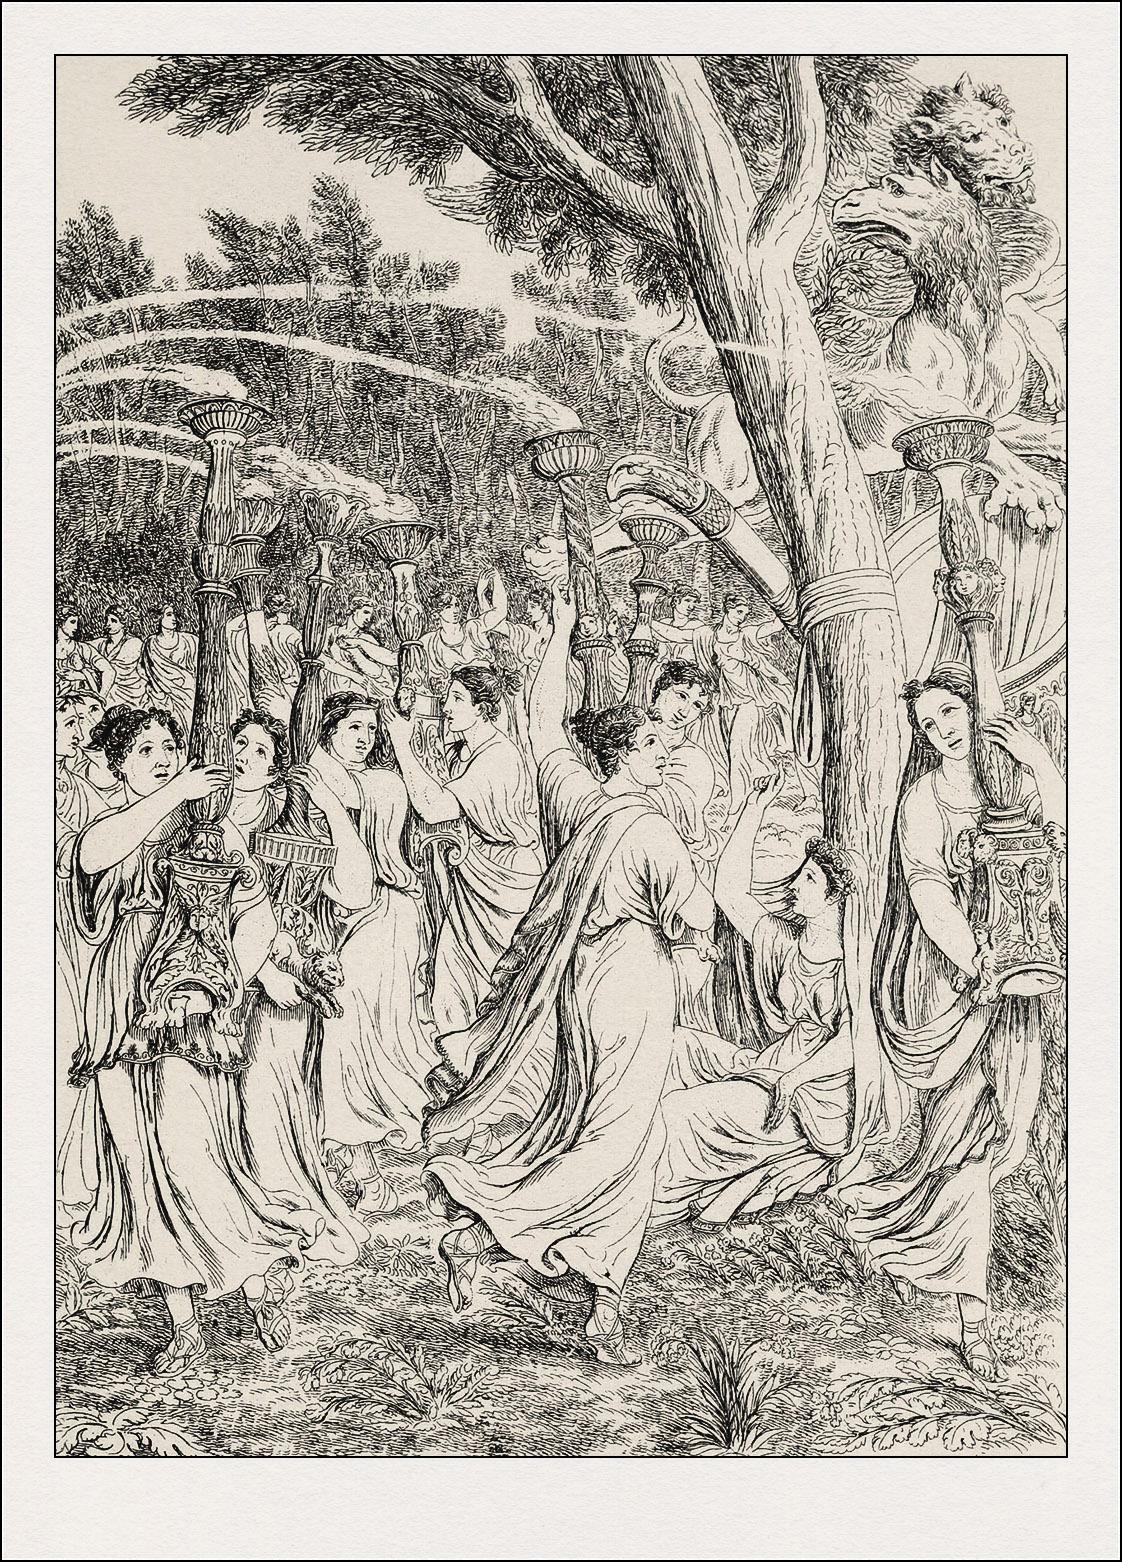 Luigi Adamolli, La divina commedia, Purgatorio